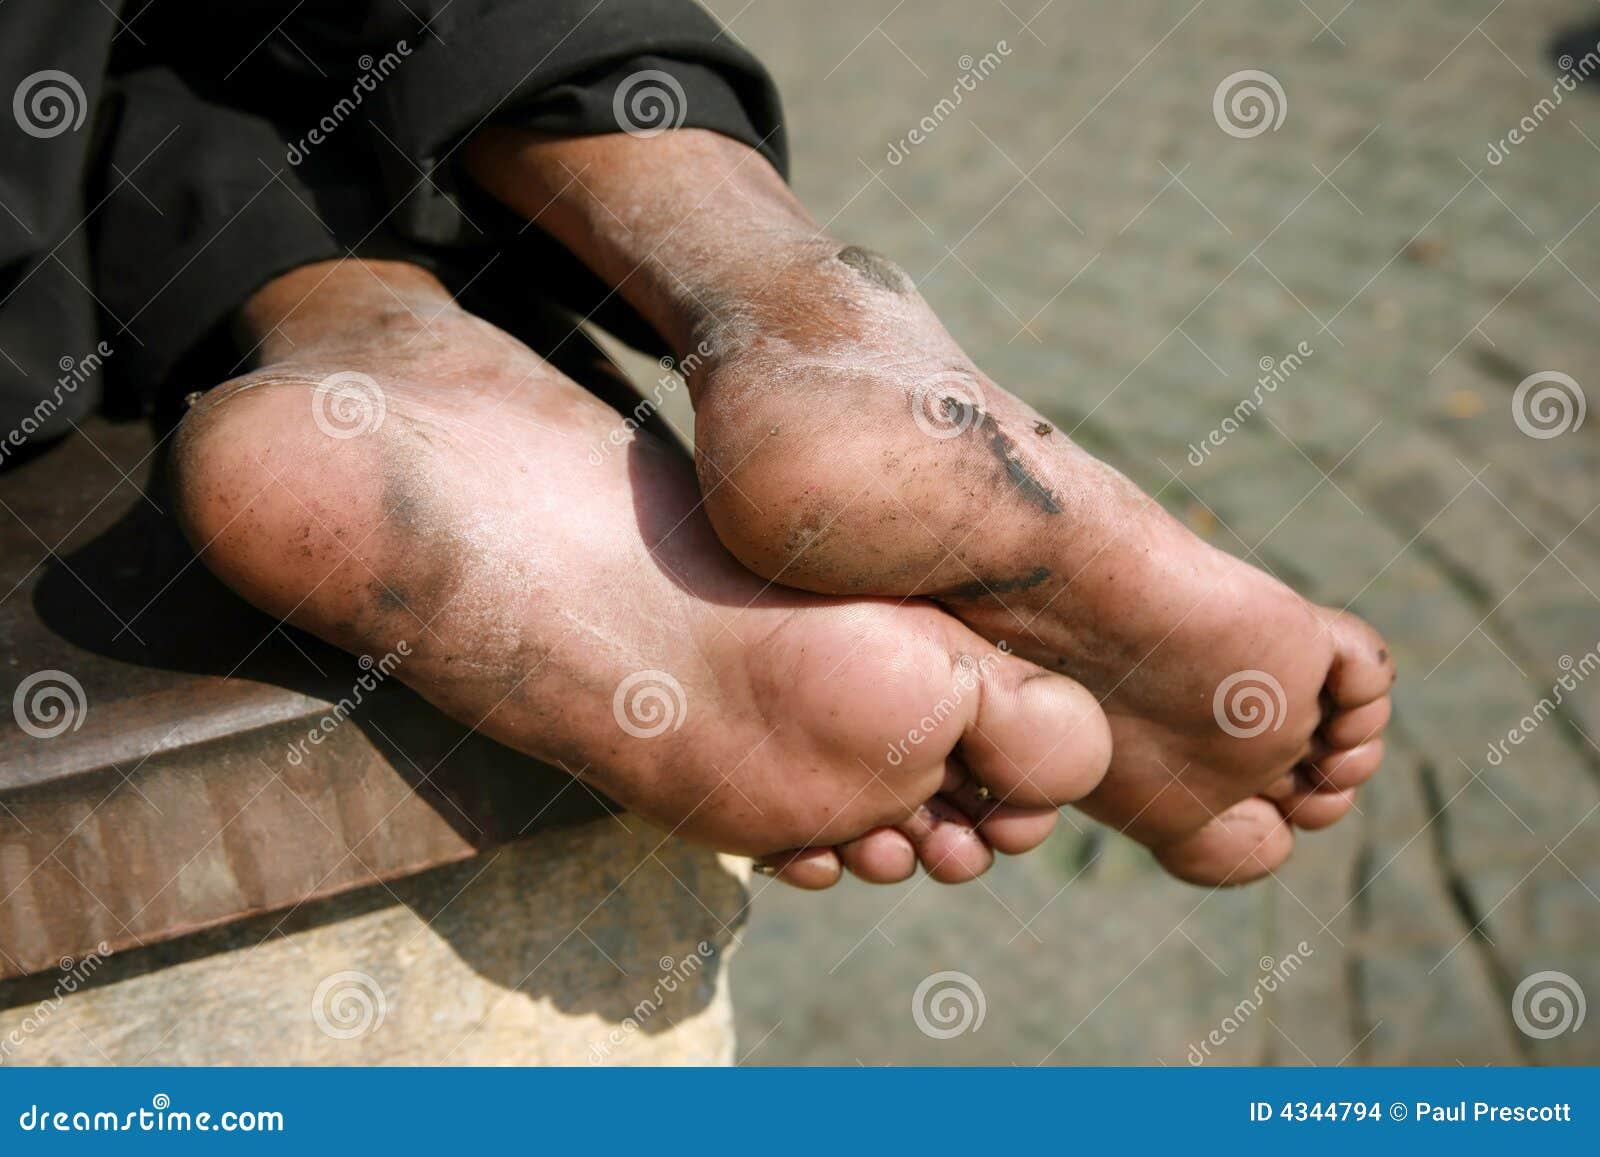 gay feet feet